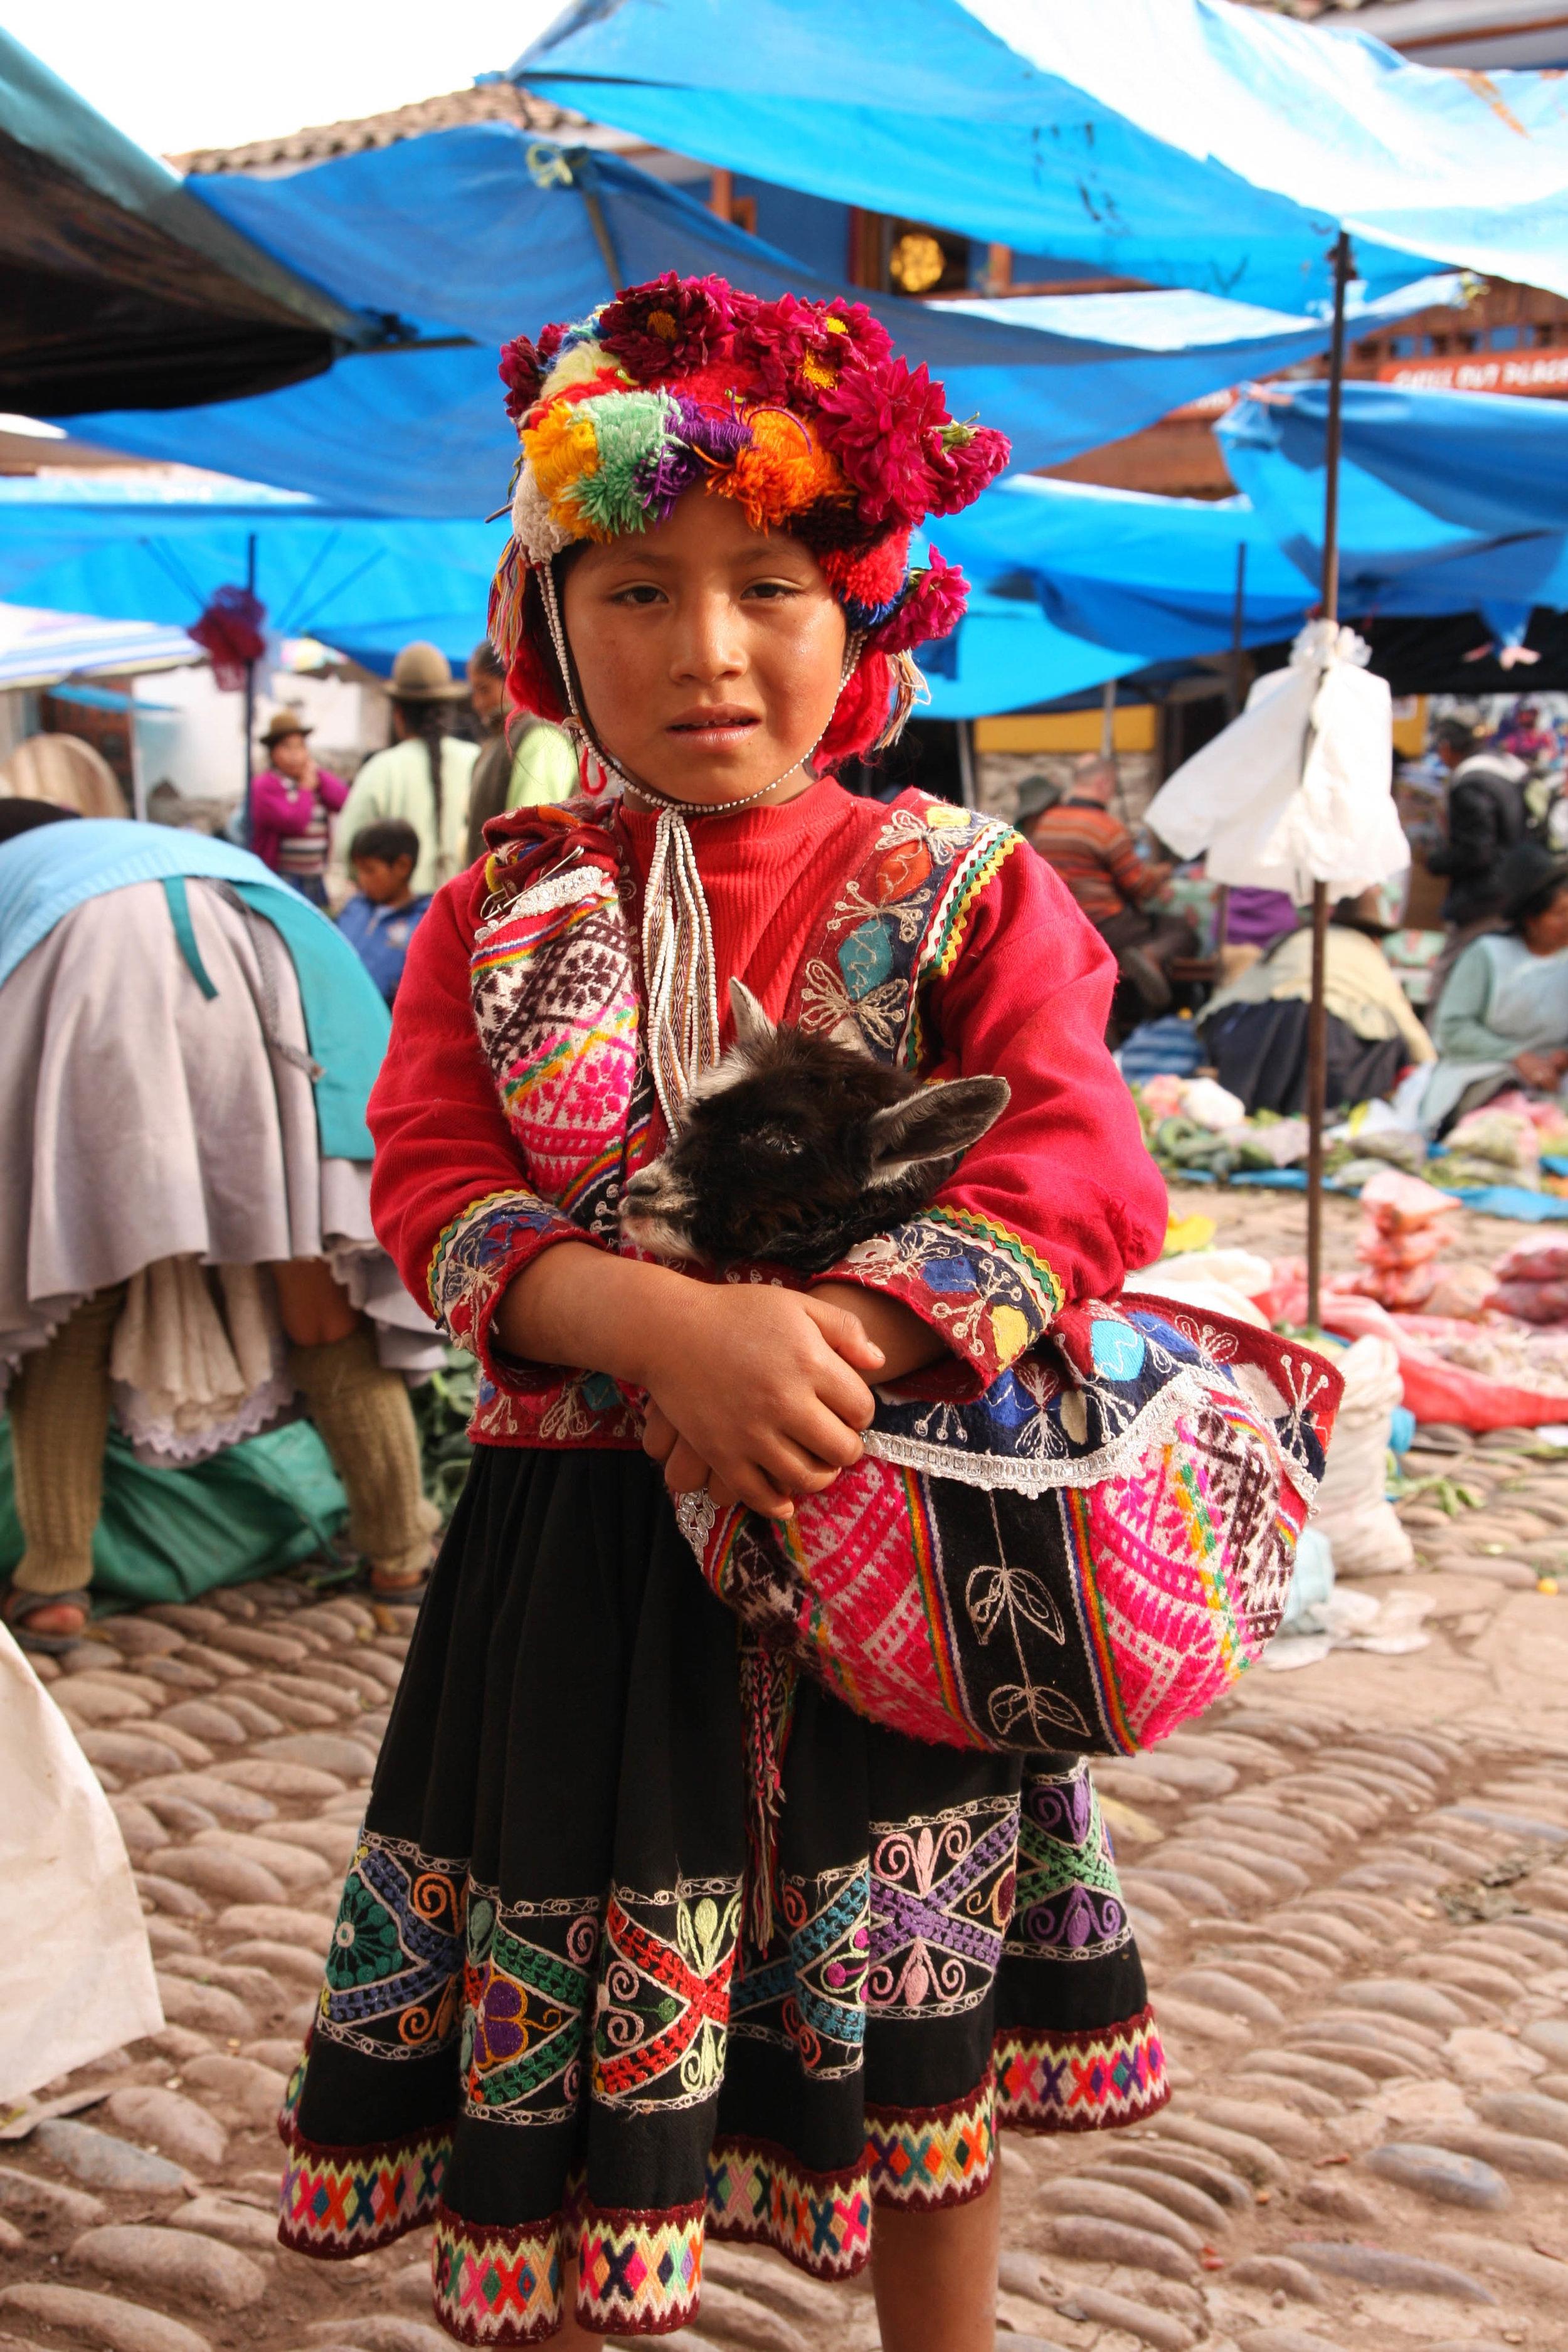 in the Pisac market